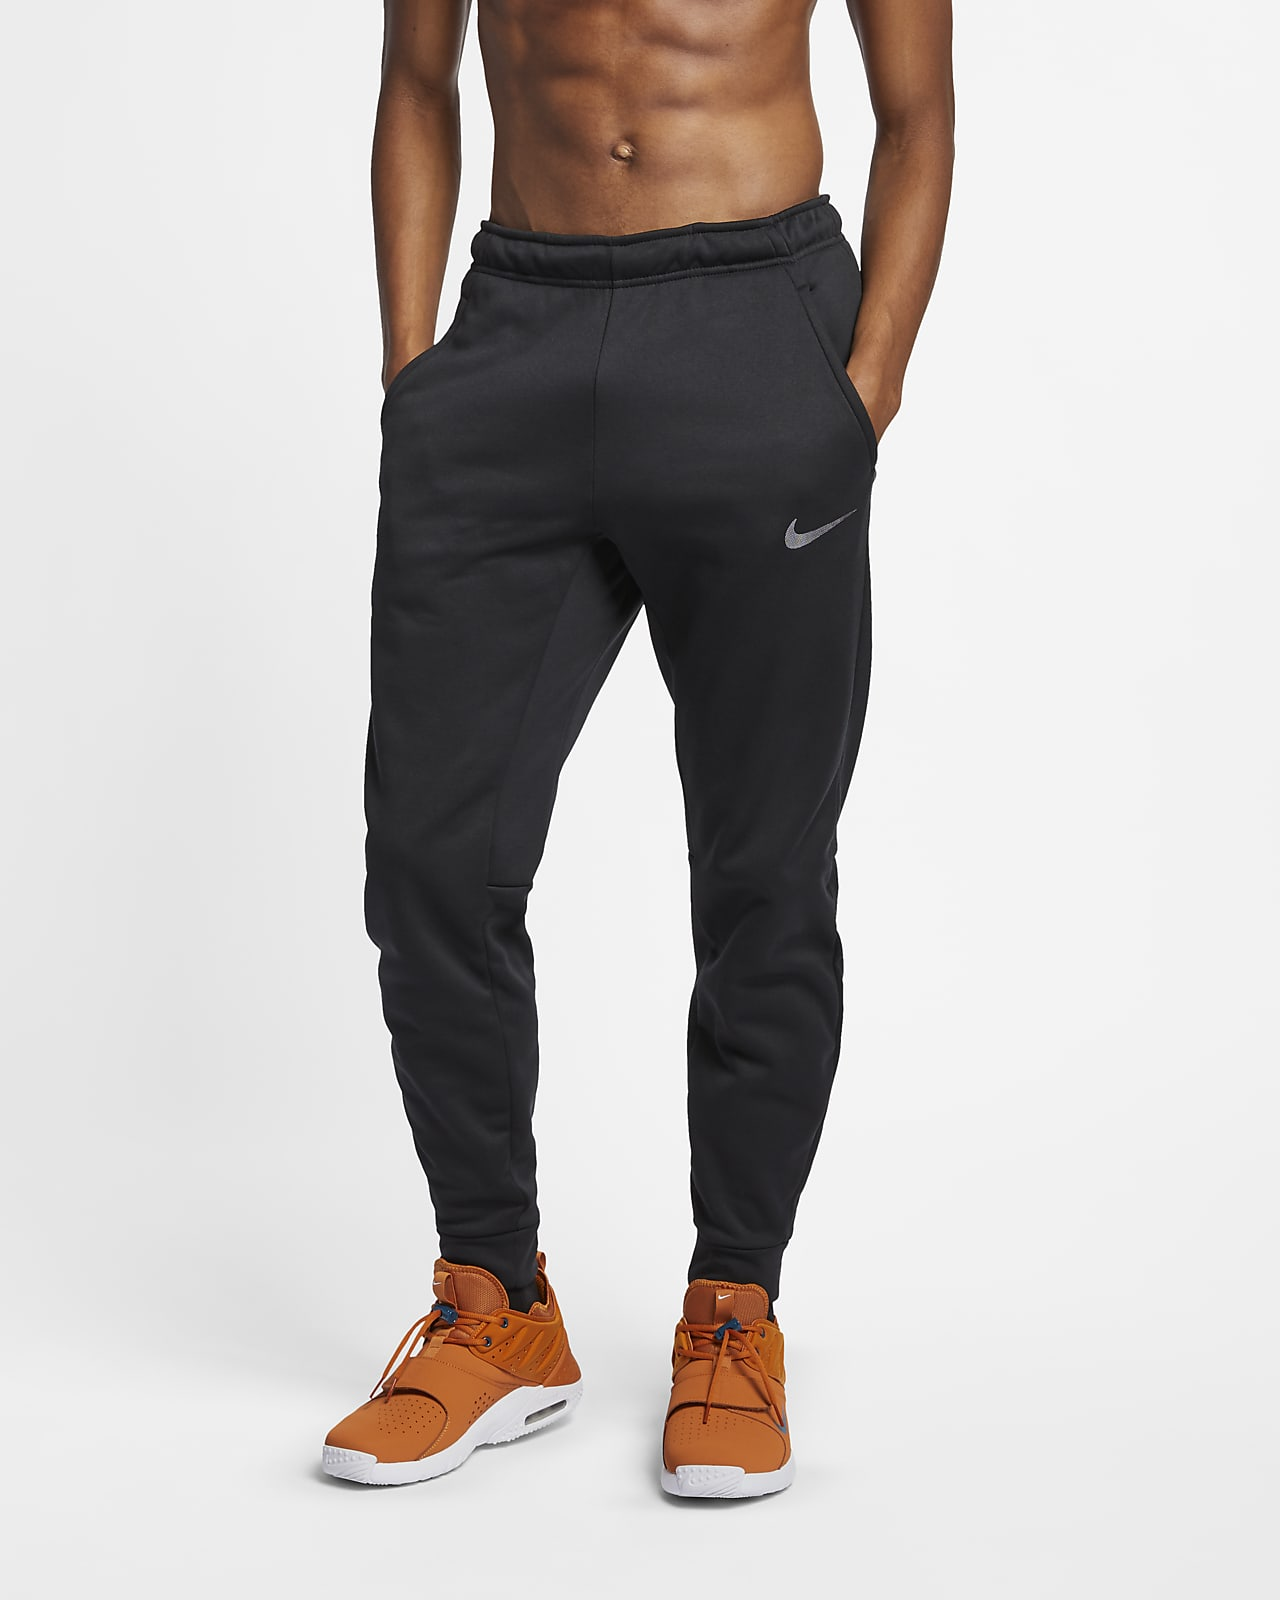 Nike Therma-FIT avsmalnet treningsbukse til herre